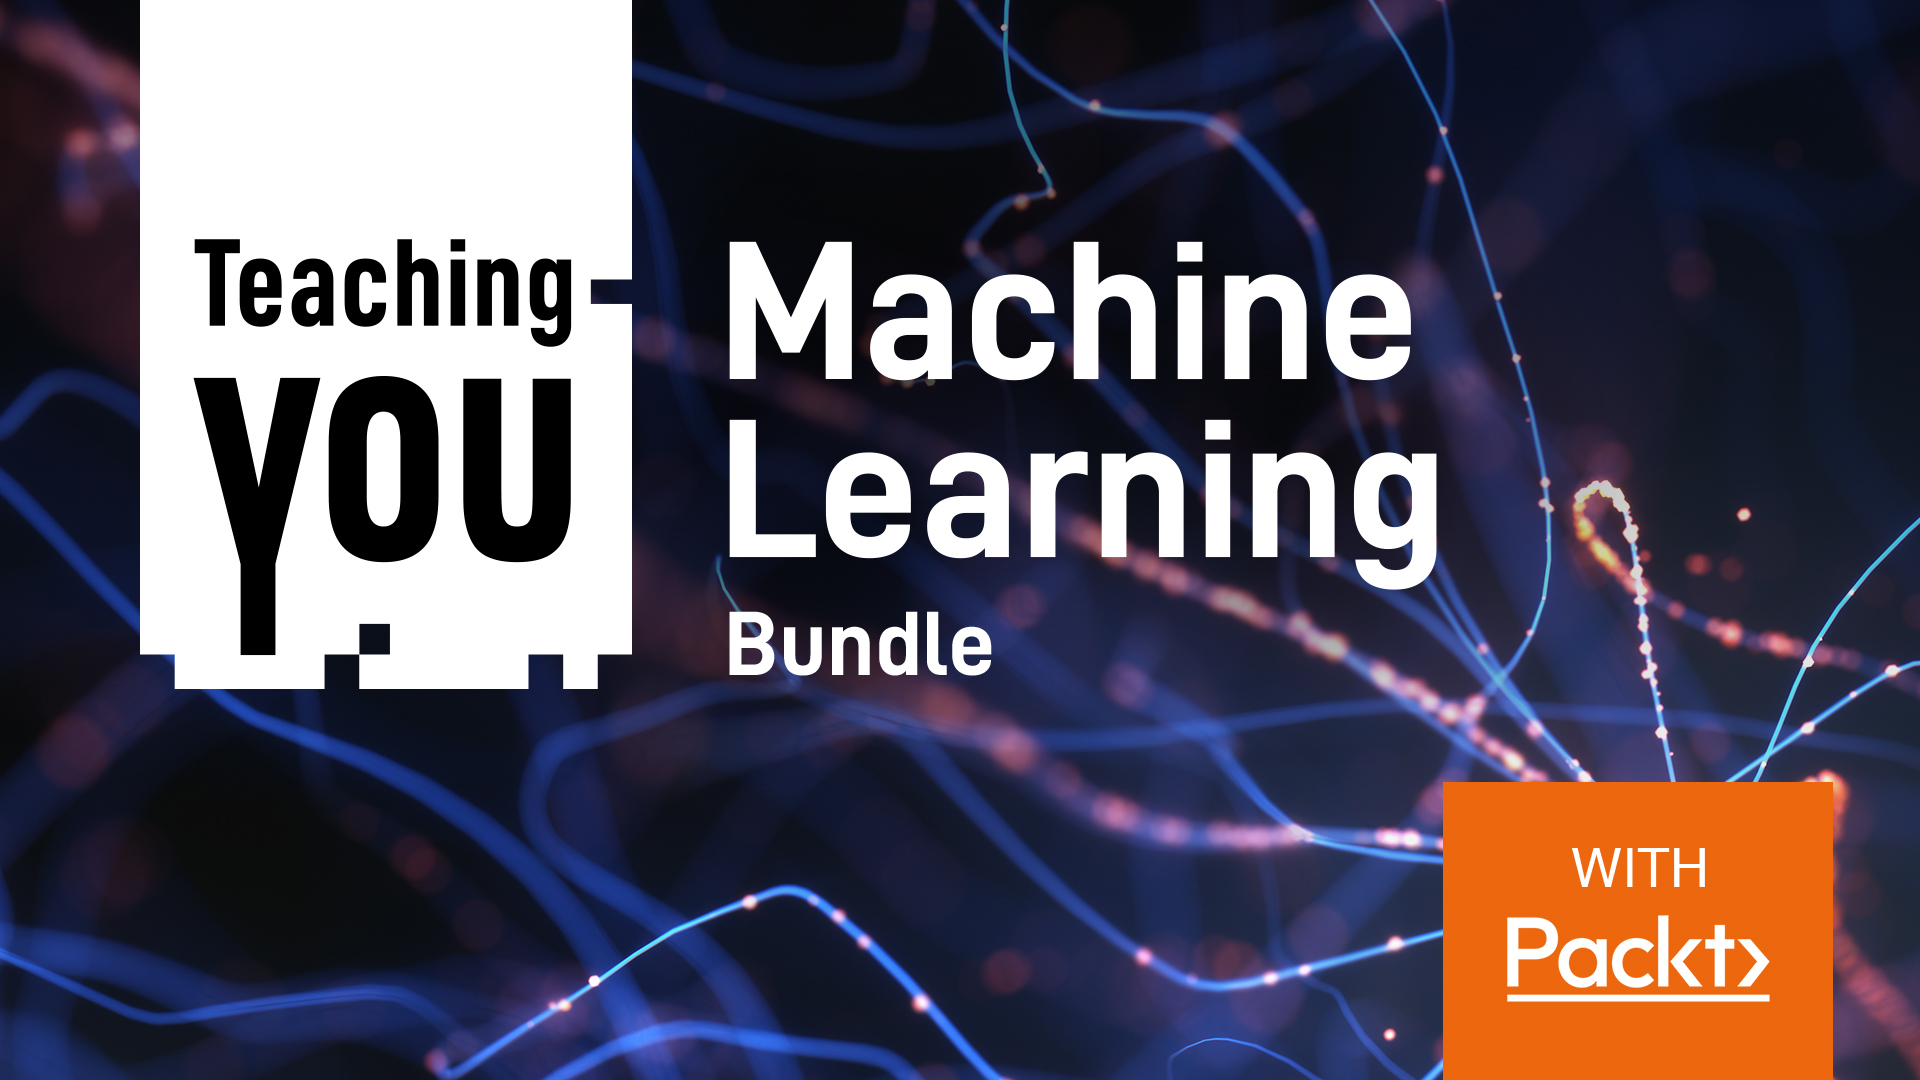 Machine Learning Bundle   Game Bundle   Fanatical